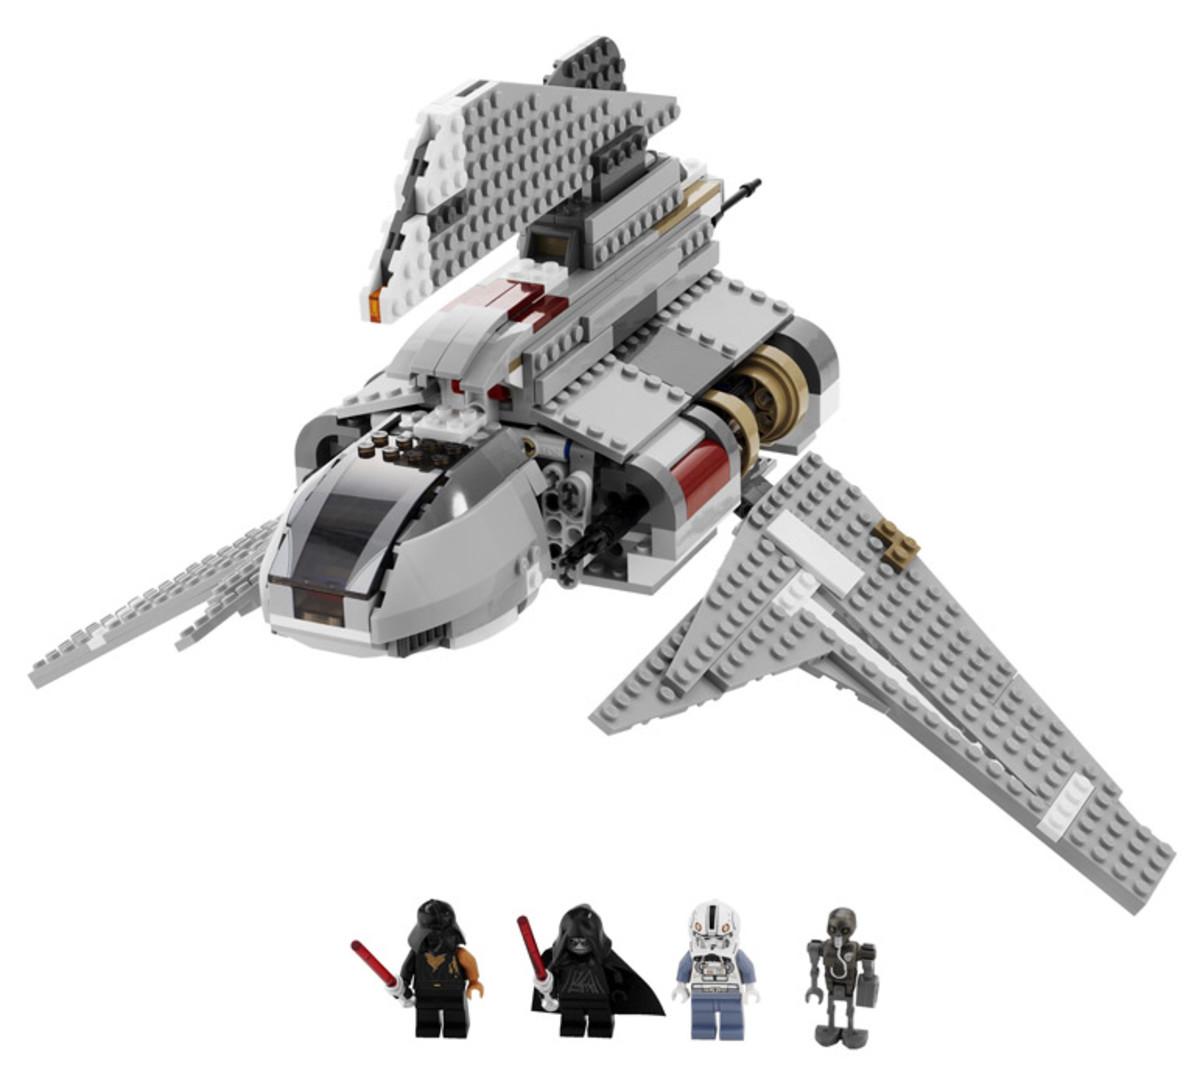 LEGO Star Wars Emperor Palpatine's Shuttle 8096 Assembled